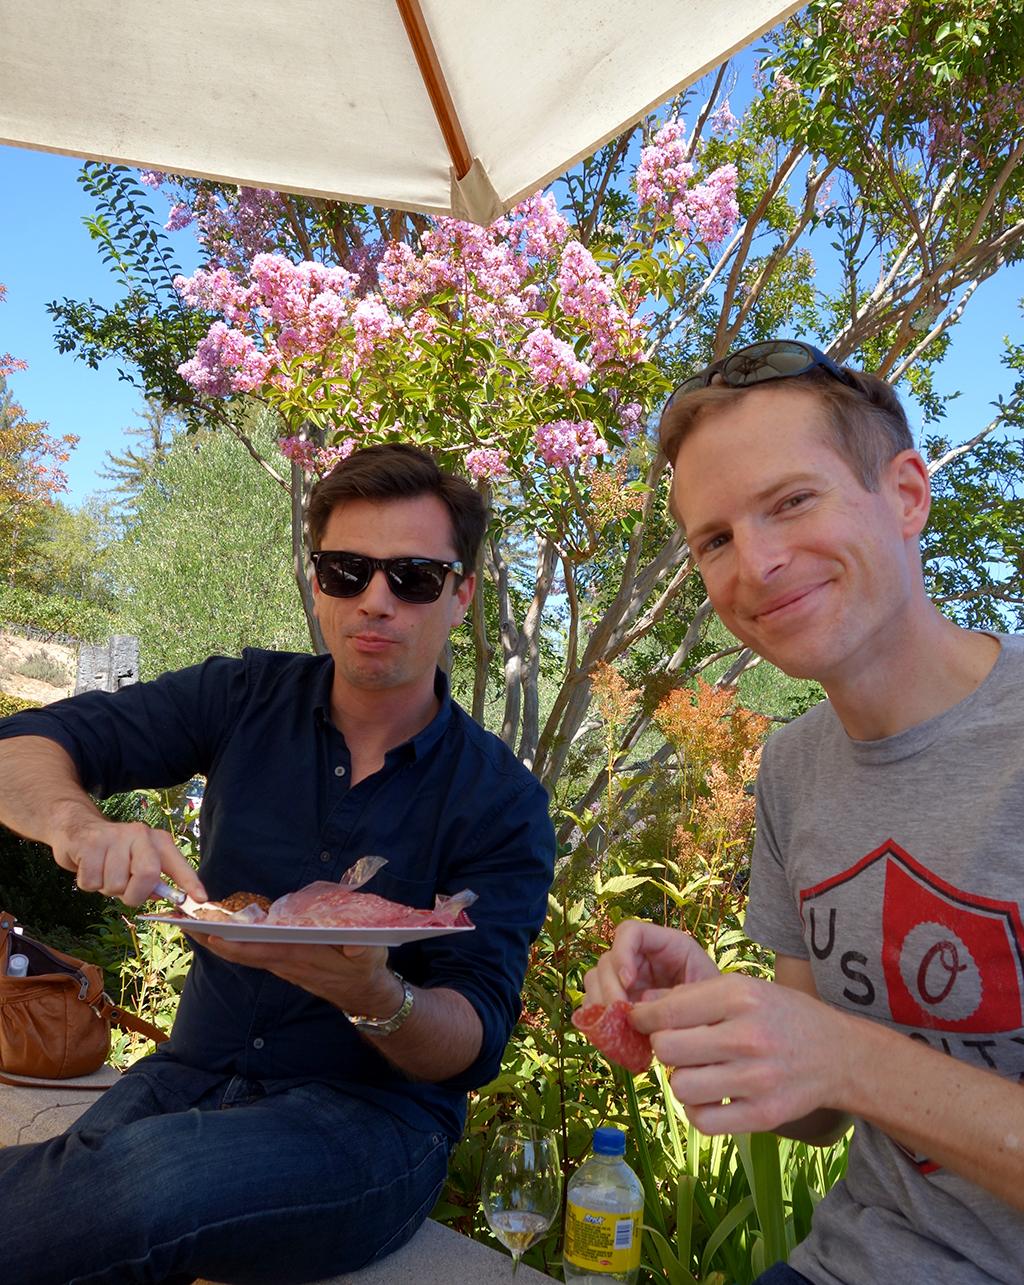 Marimar winery salami picnic